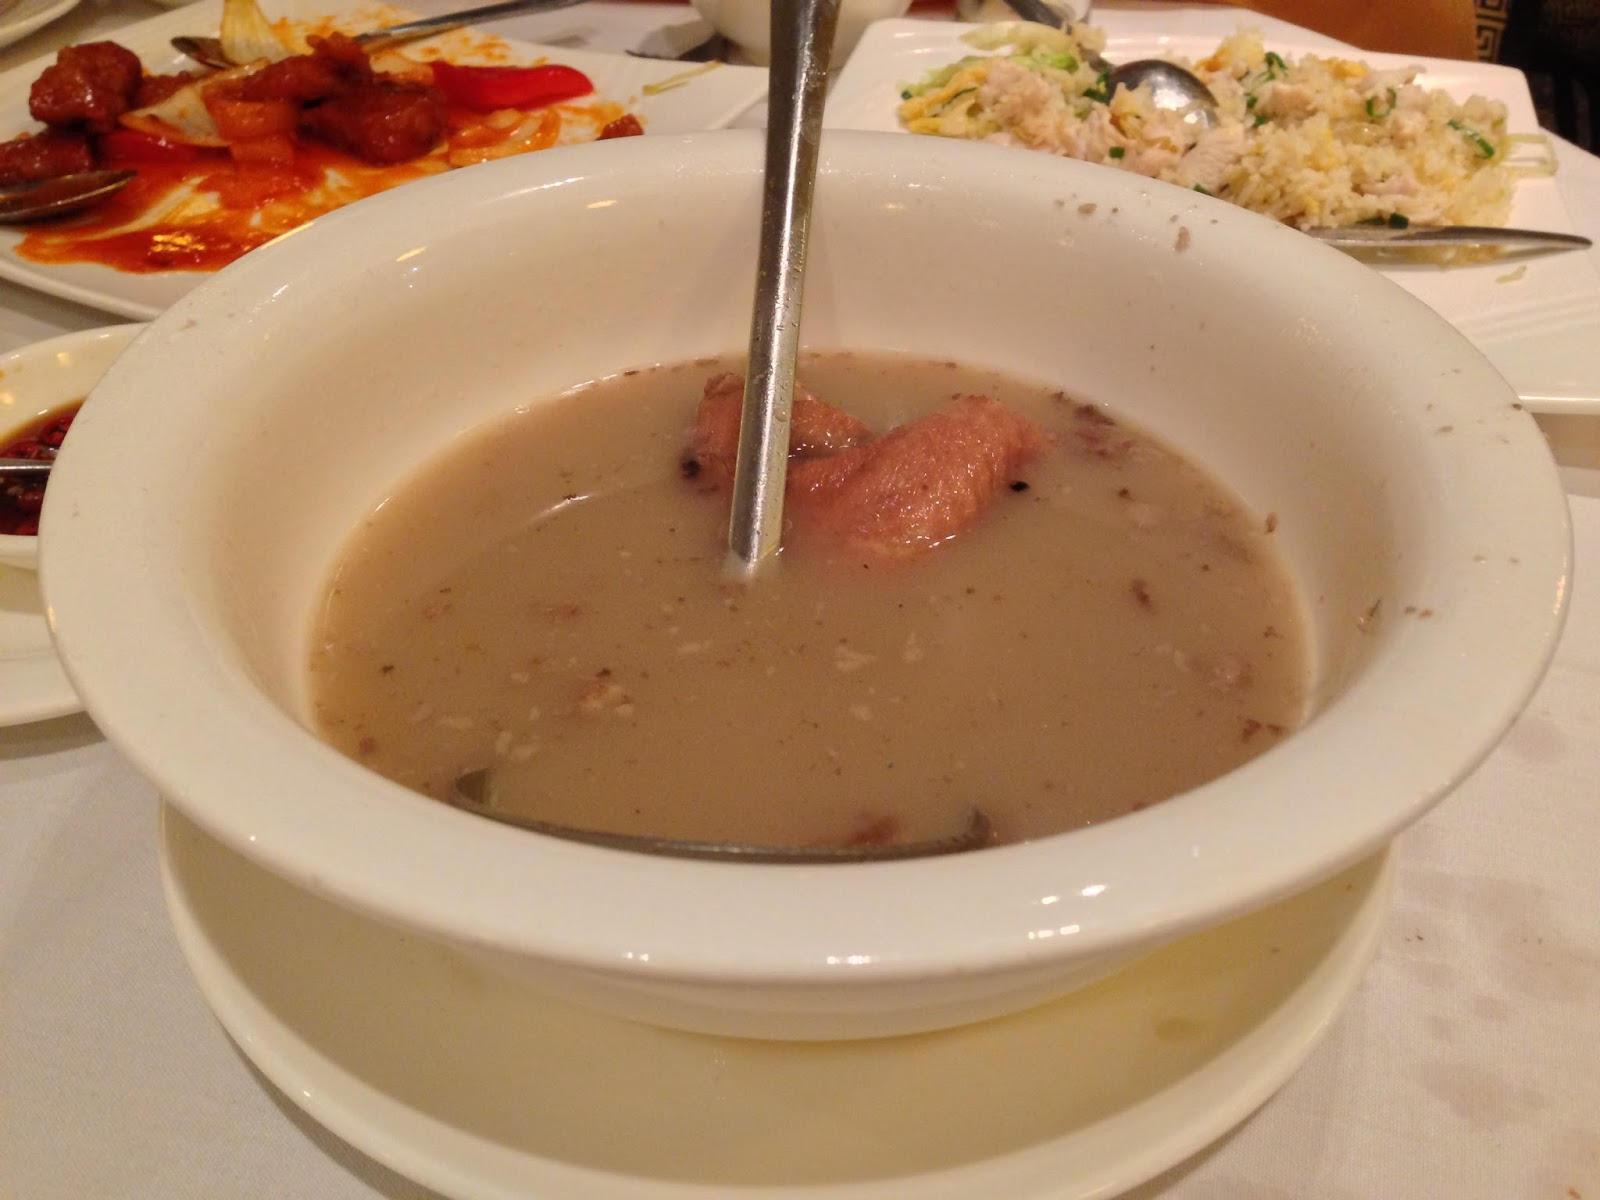 Ilovemyfoodlots imperial treasure chinese restaurant for Asian cuisine in australia